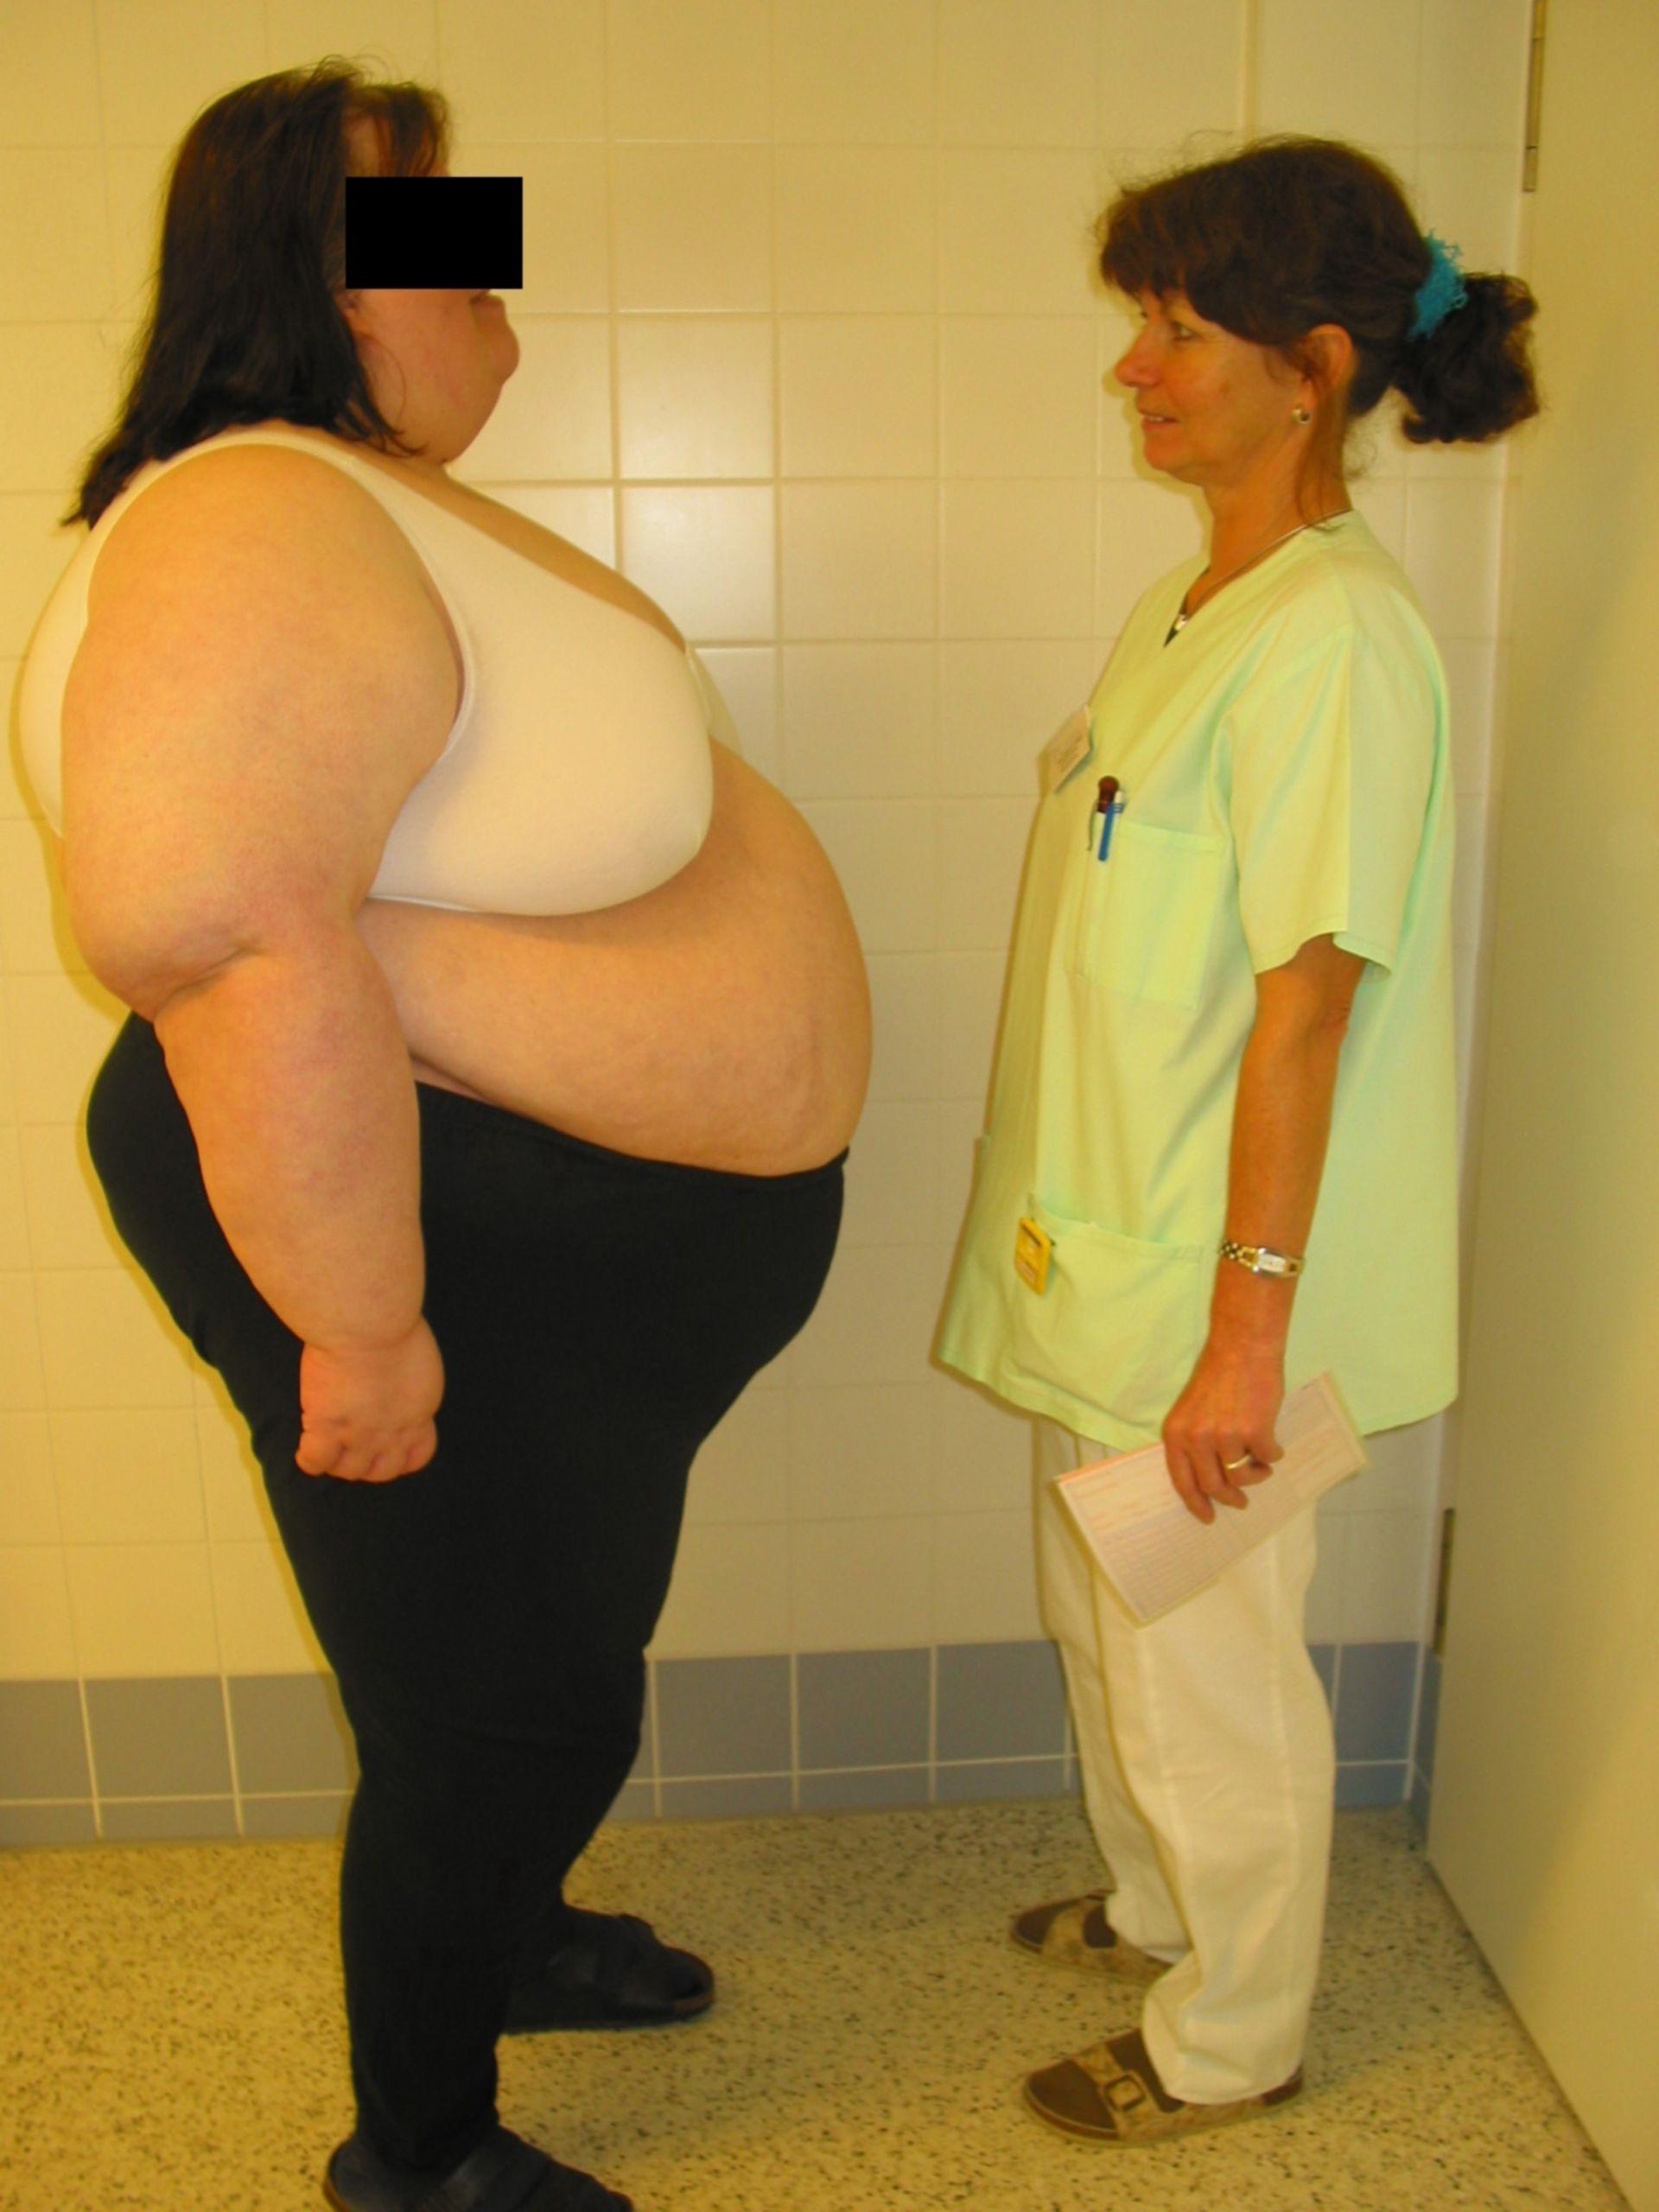 Adiposità - 215 kg